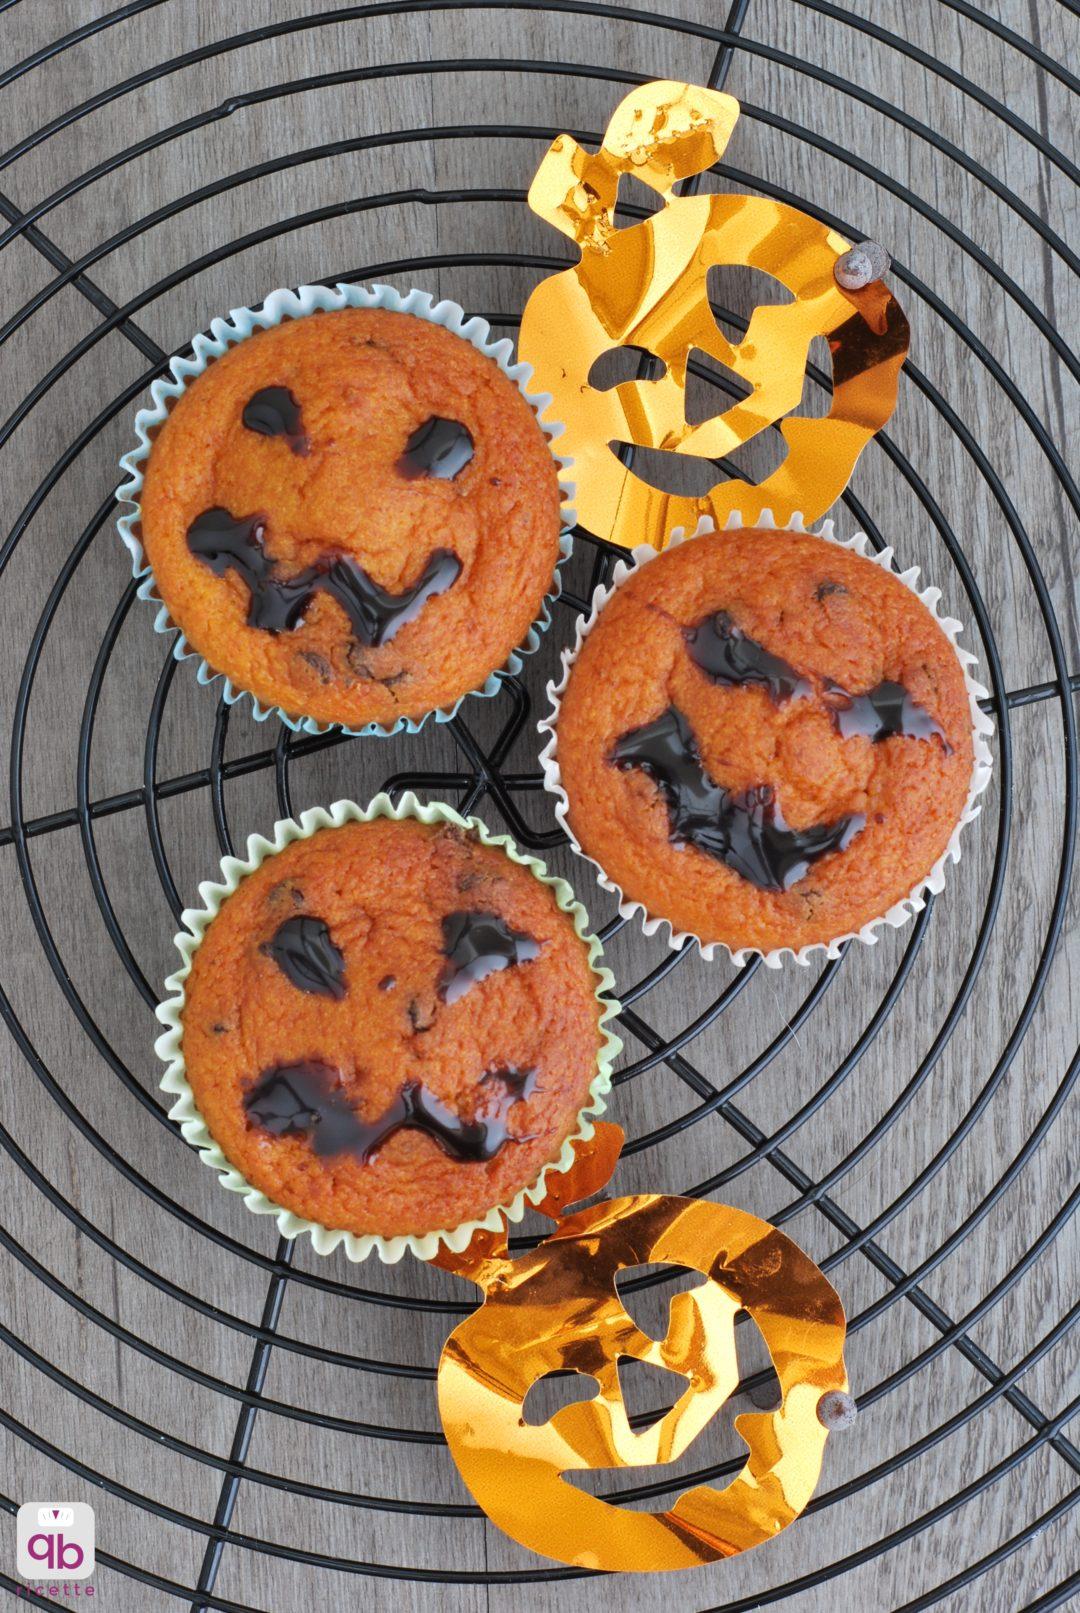 Ben noto Muffin alla zucca | QB Ricette GX17